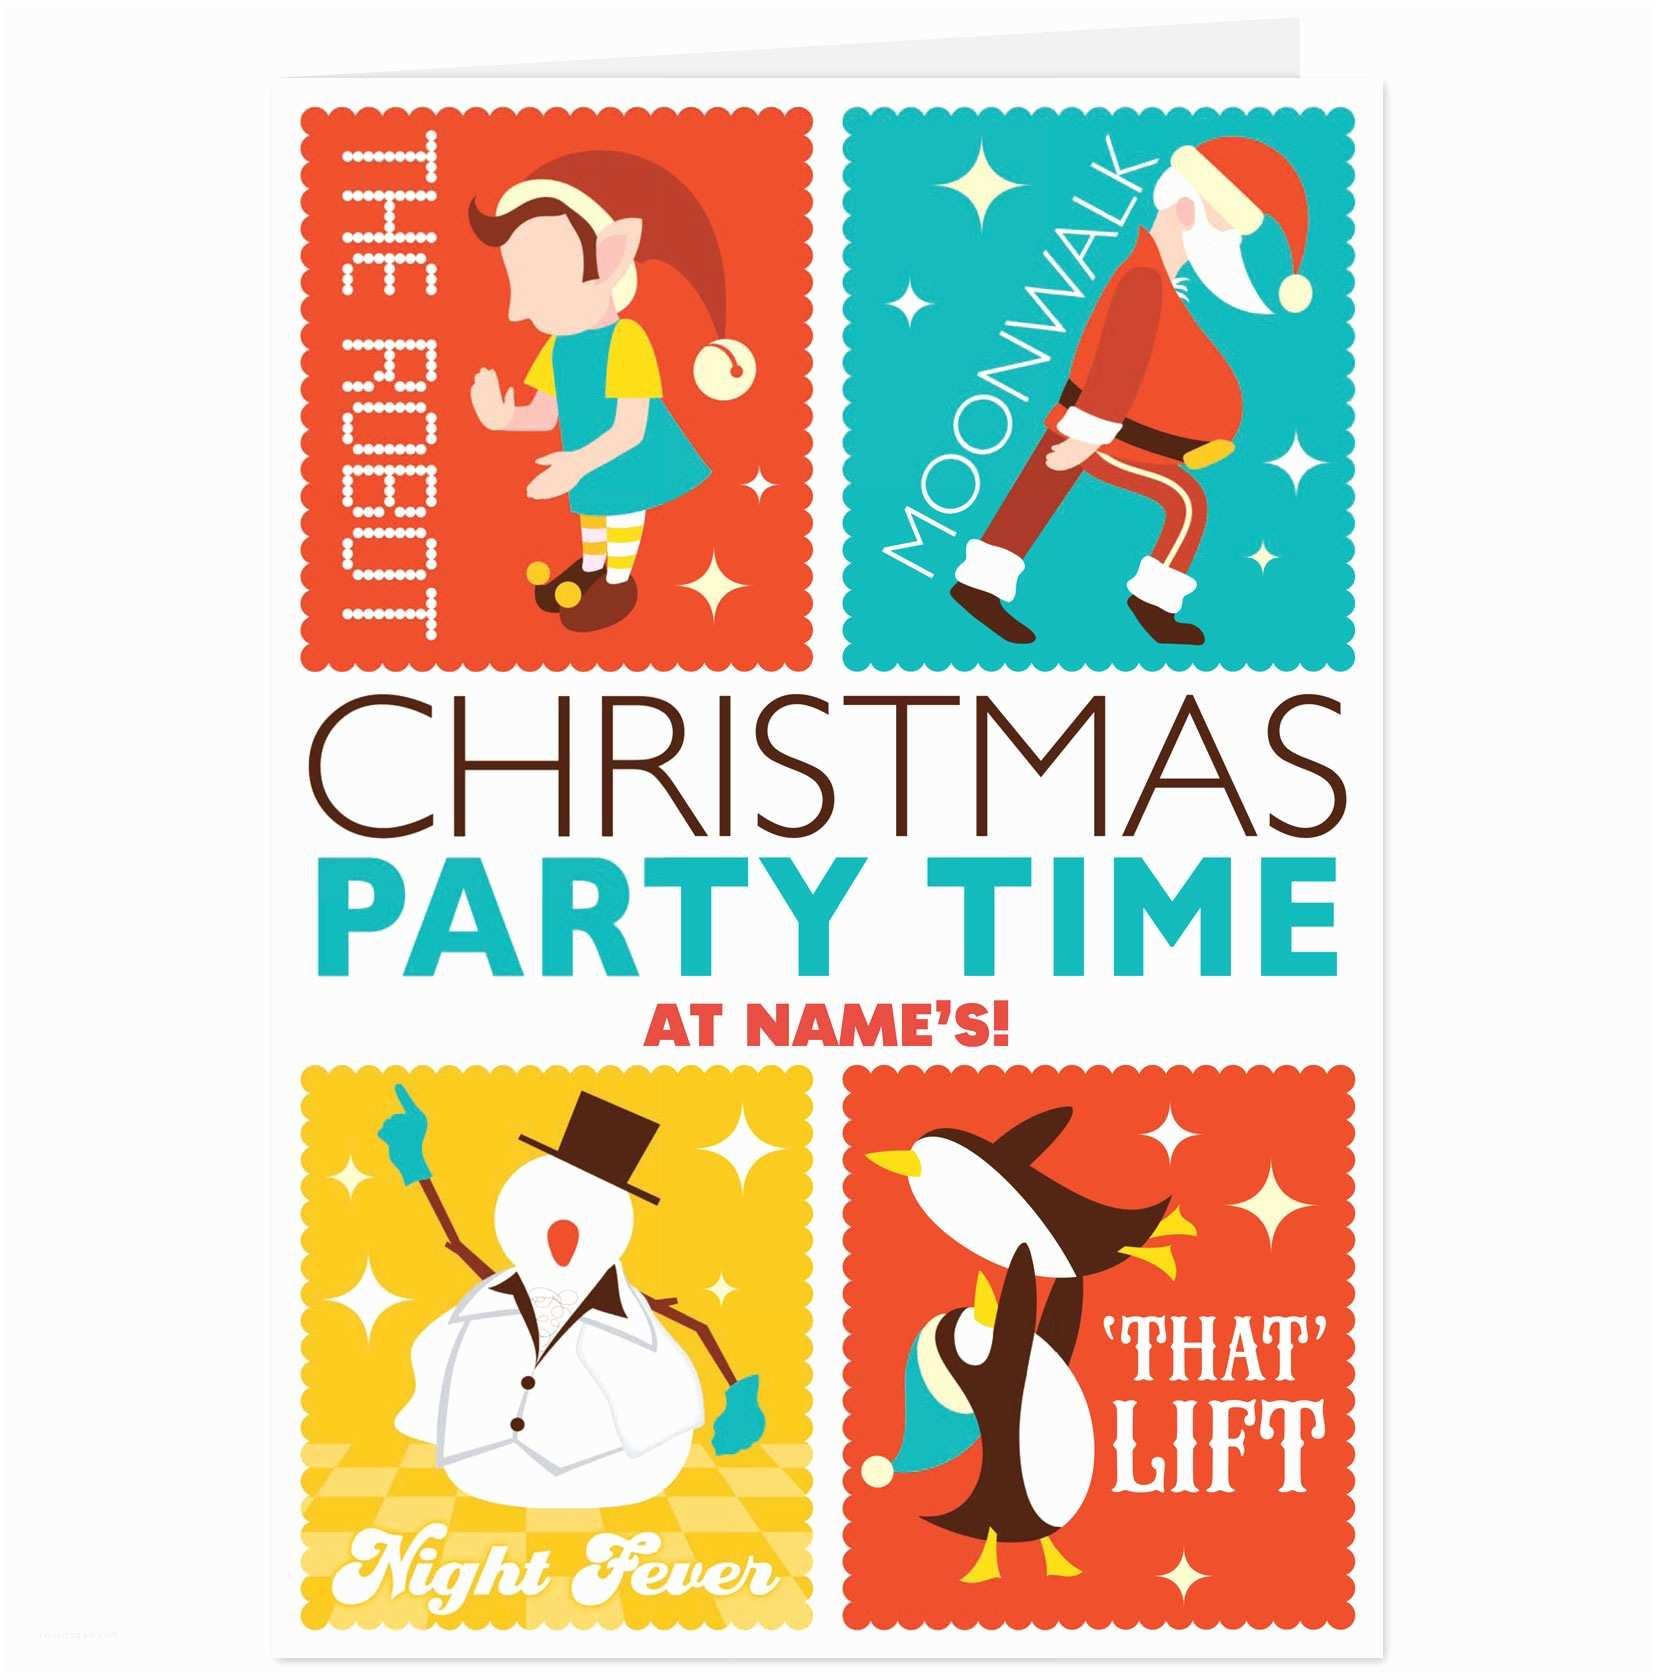 Funny Holiday Party Invitations Funny Christmas Party Invitations